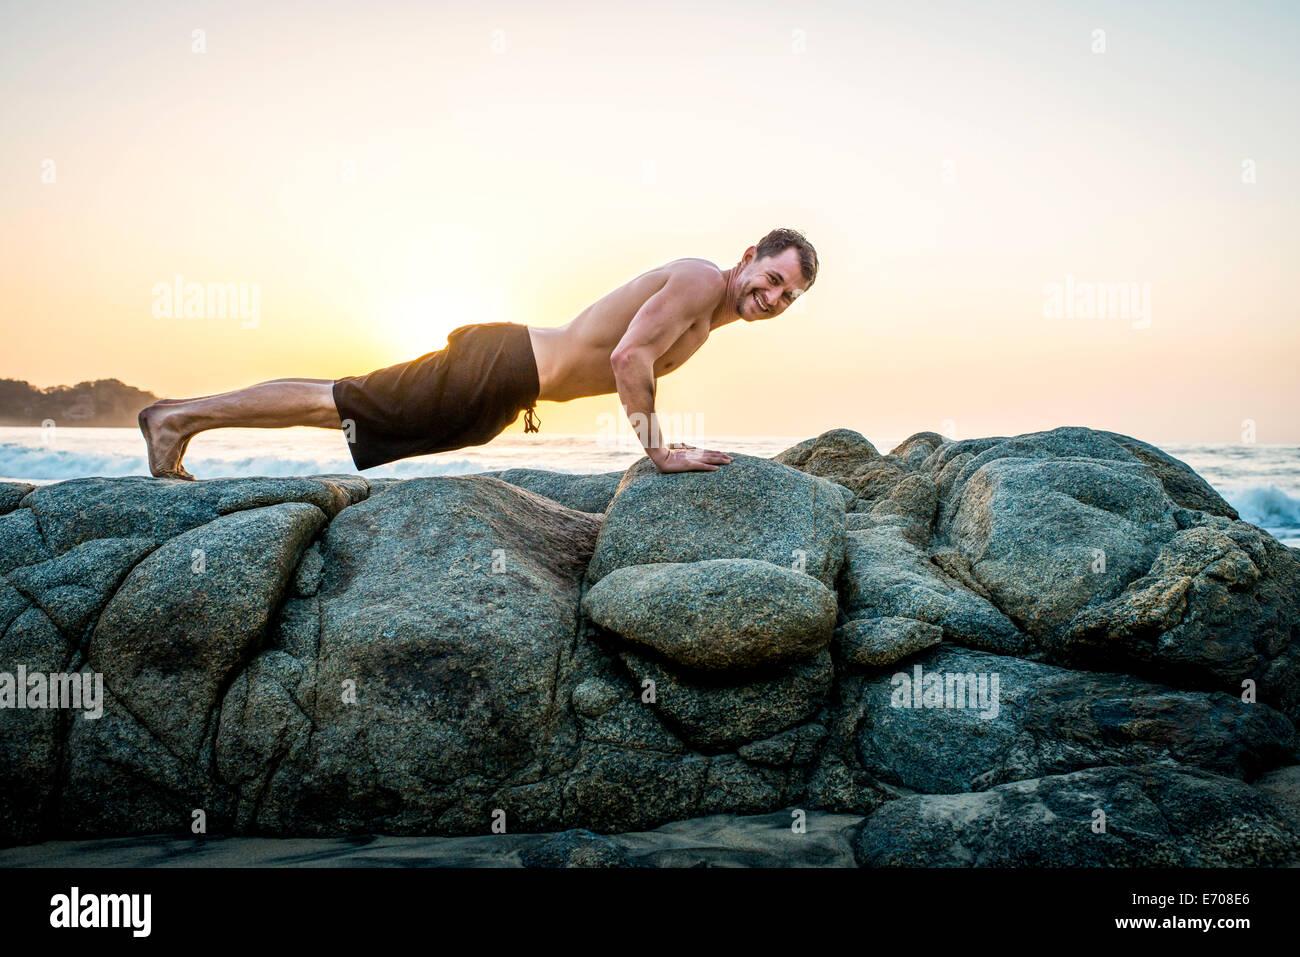 Mid adult man doing push-ups on rocks at beach Stock Photo